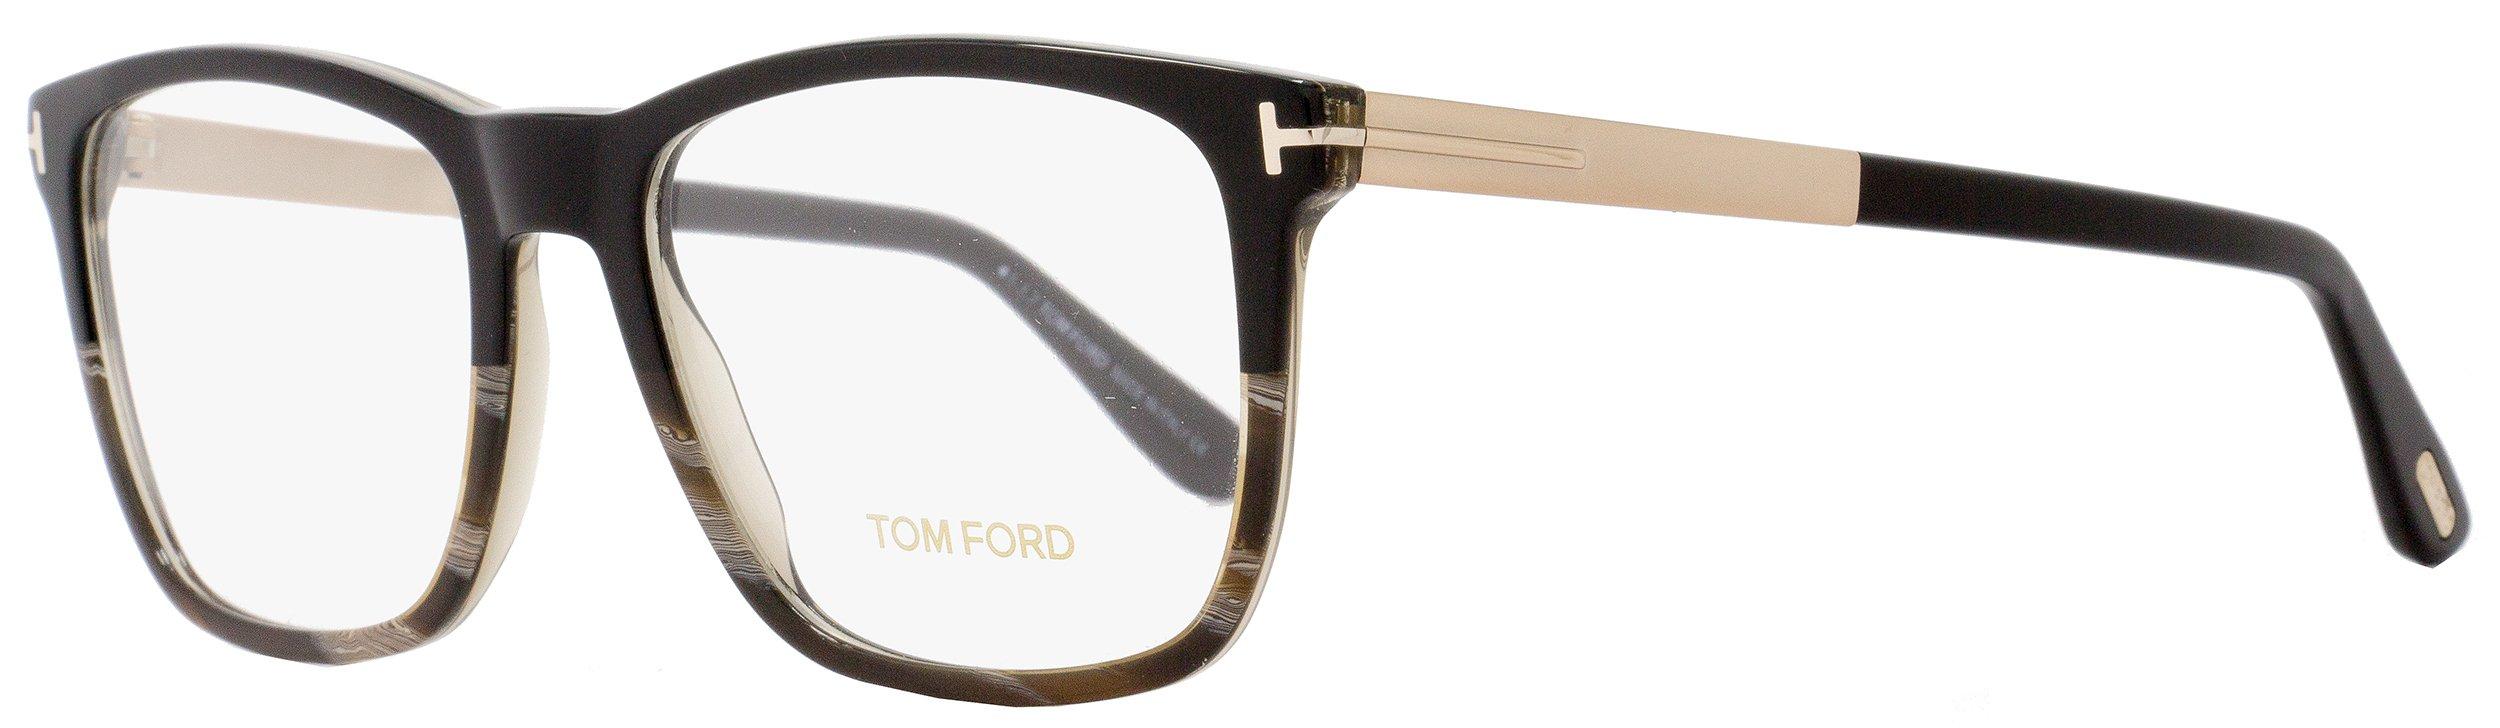 Tom Ford Eyeglasses TF 5351 5 Black Multicolor 54mm